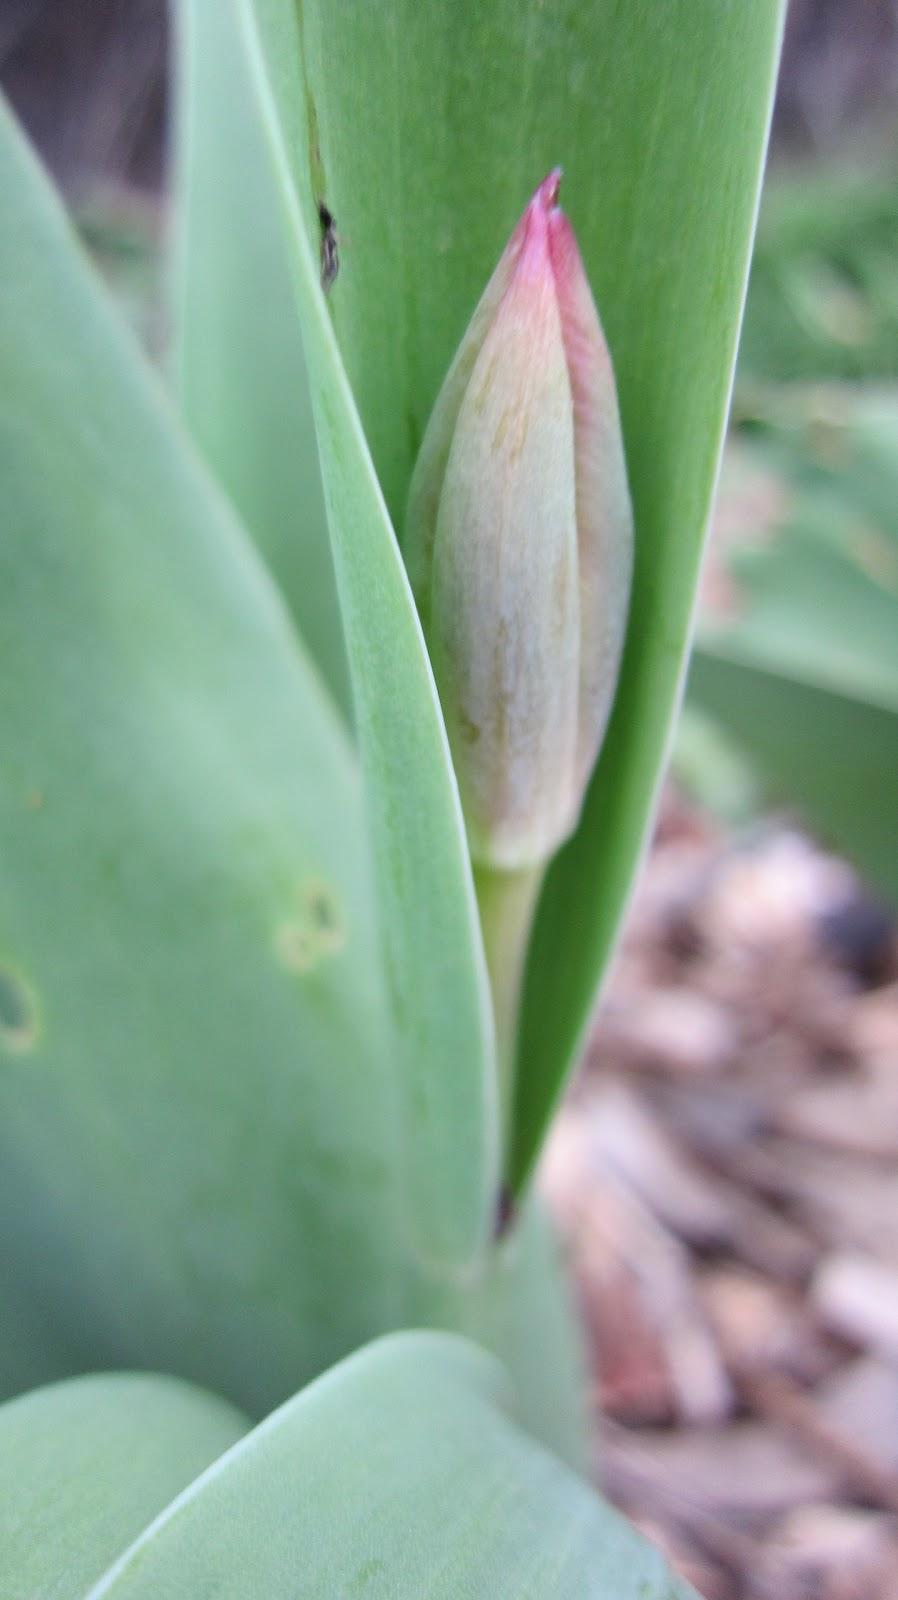 Tiptoe Through The Tulips Gyaru Makeup Tutorial: BiRDEYE Handmade: Tiptoe Through The Tulips With Me